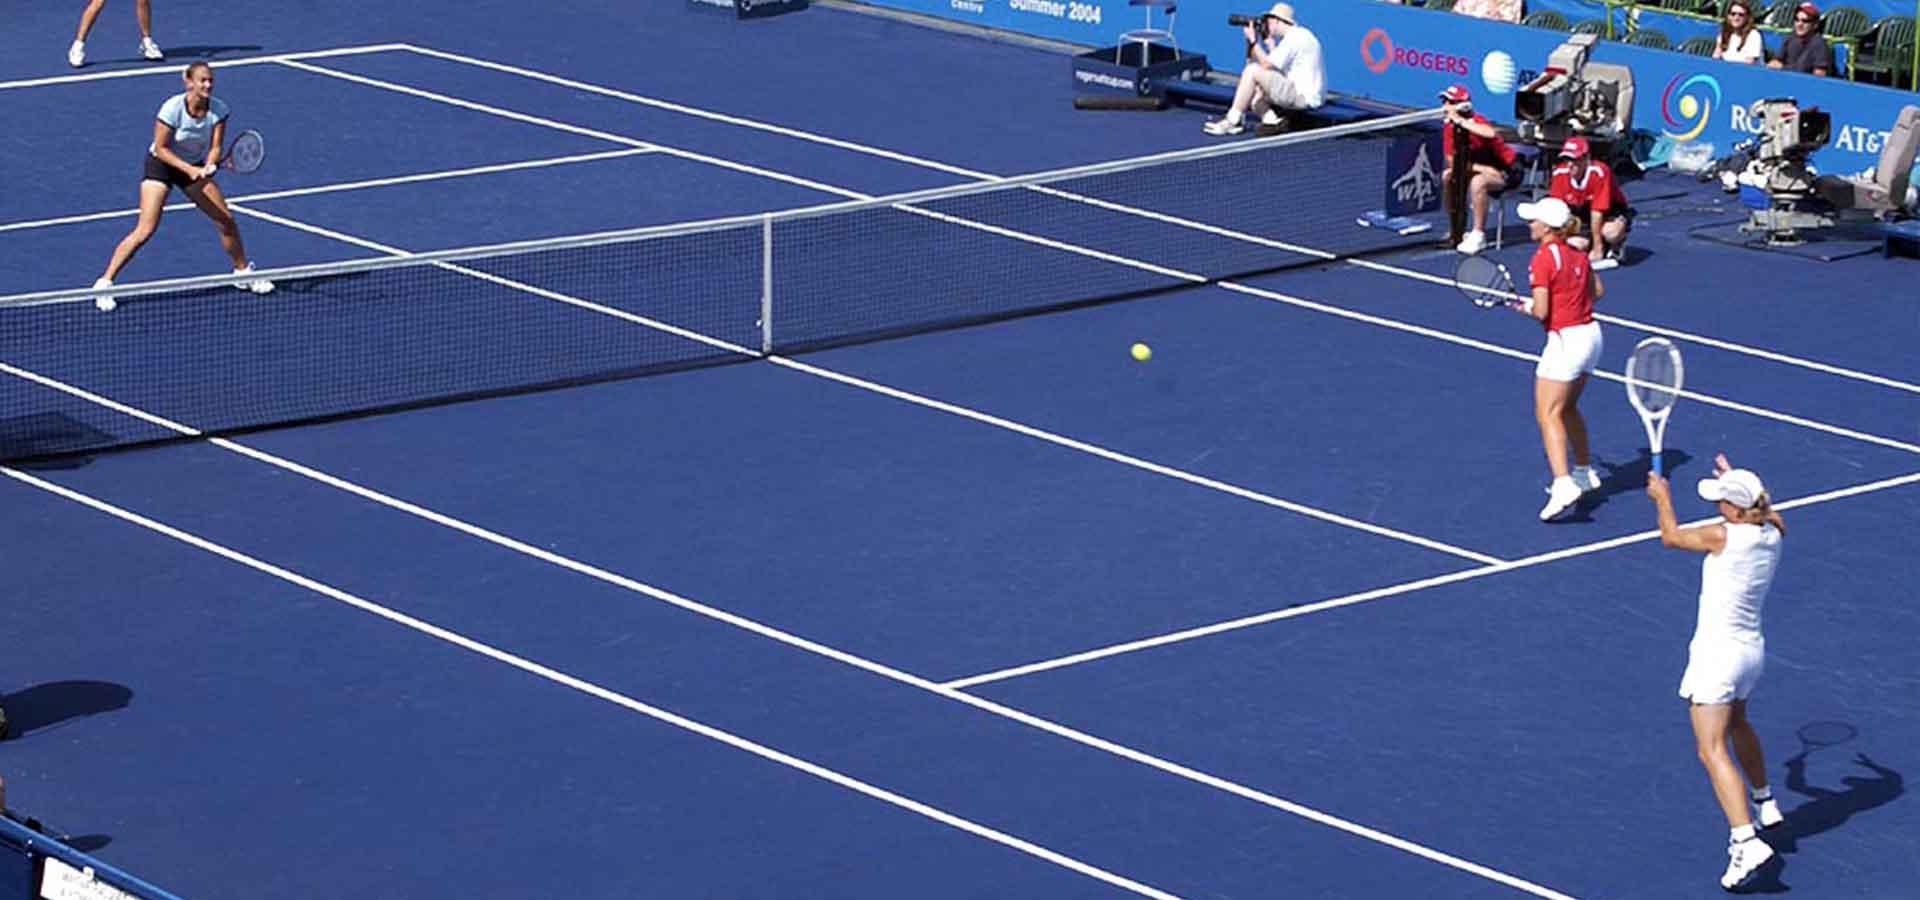 Tennis #ForBullgaria Благотворителен тенис турнир